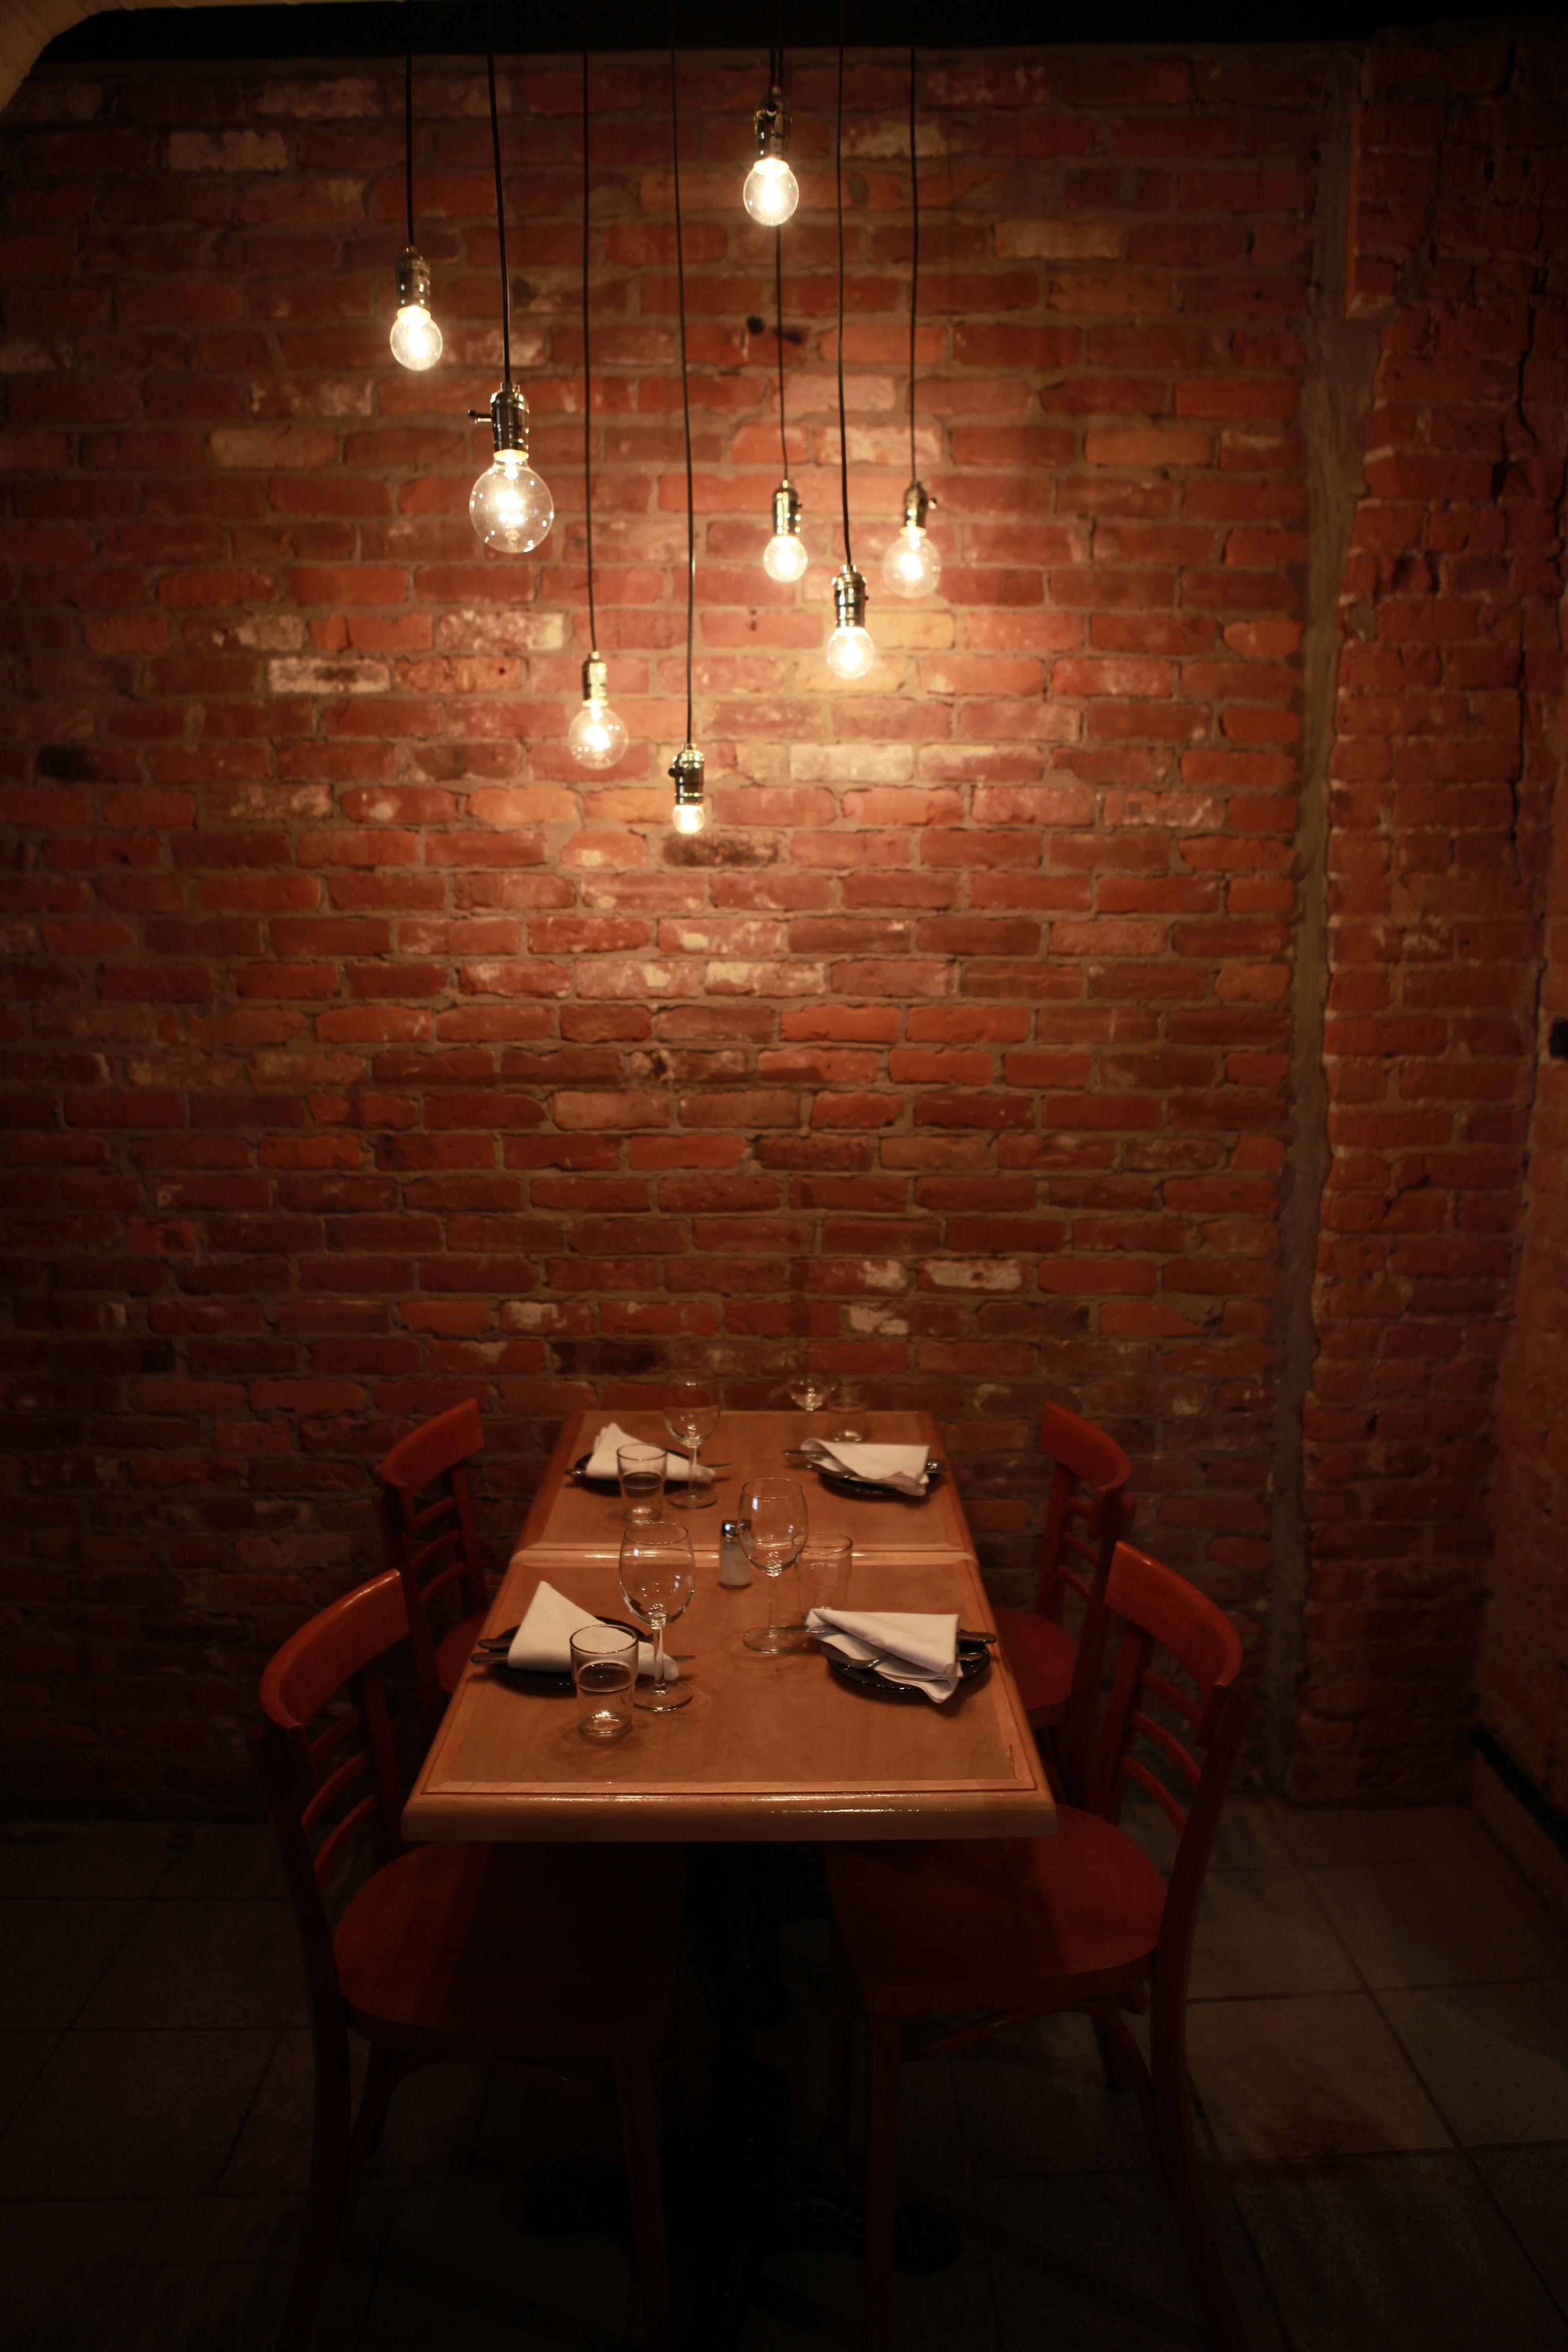 Bistro, bar, restaurant, rustic, cozy, wood, brick, design, warm ...